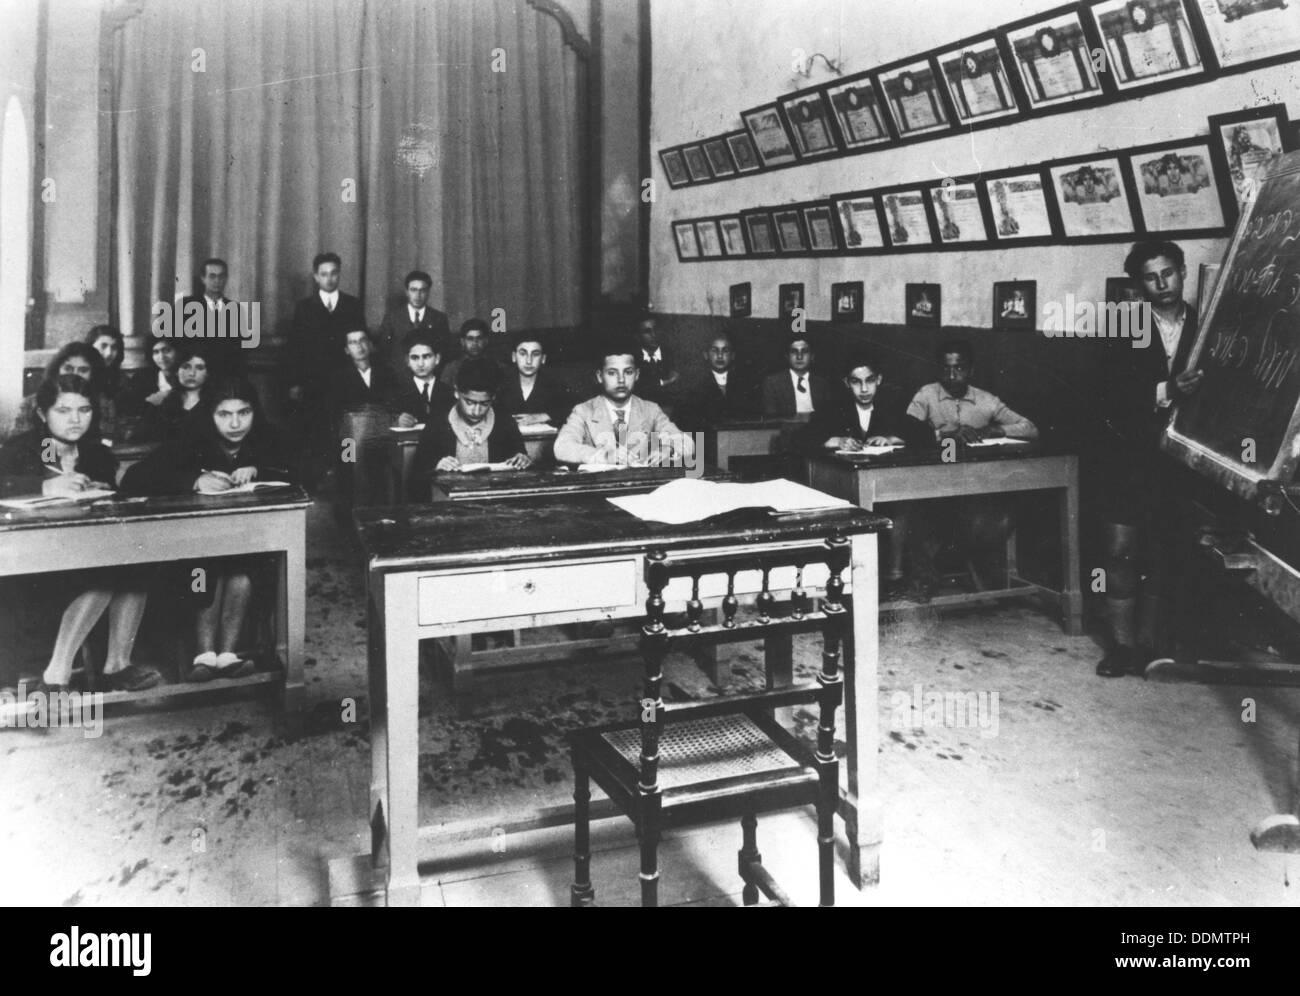 Classroom at Rosh Pinna School, Libya, c1933? - Stock Image